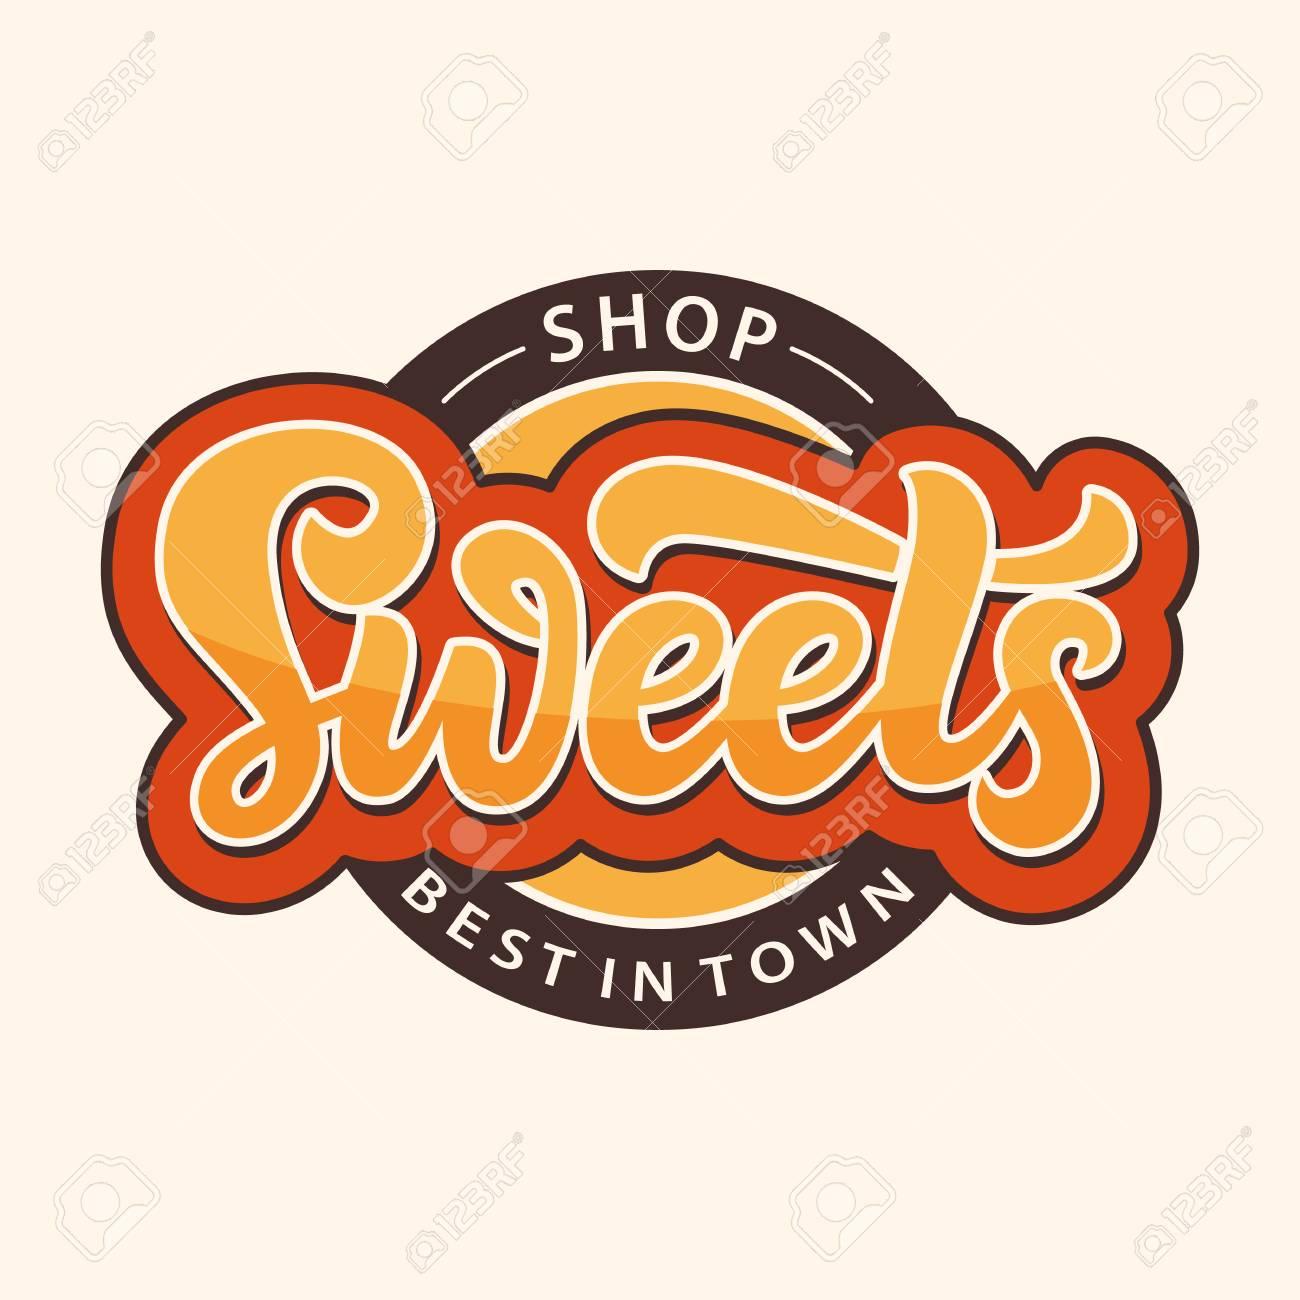 Sweets Shop logo label. Candy bar emblem design template - 112018345